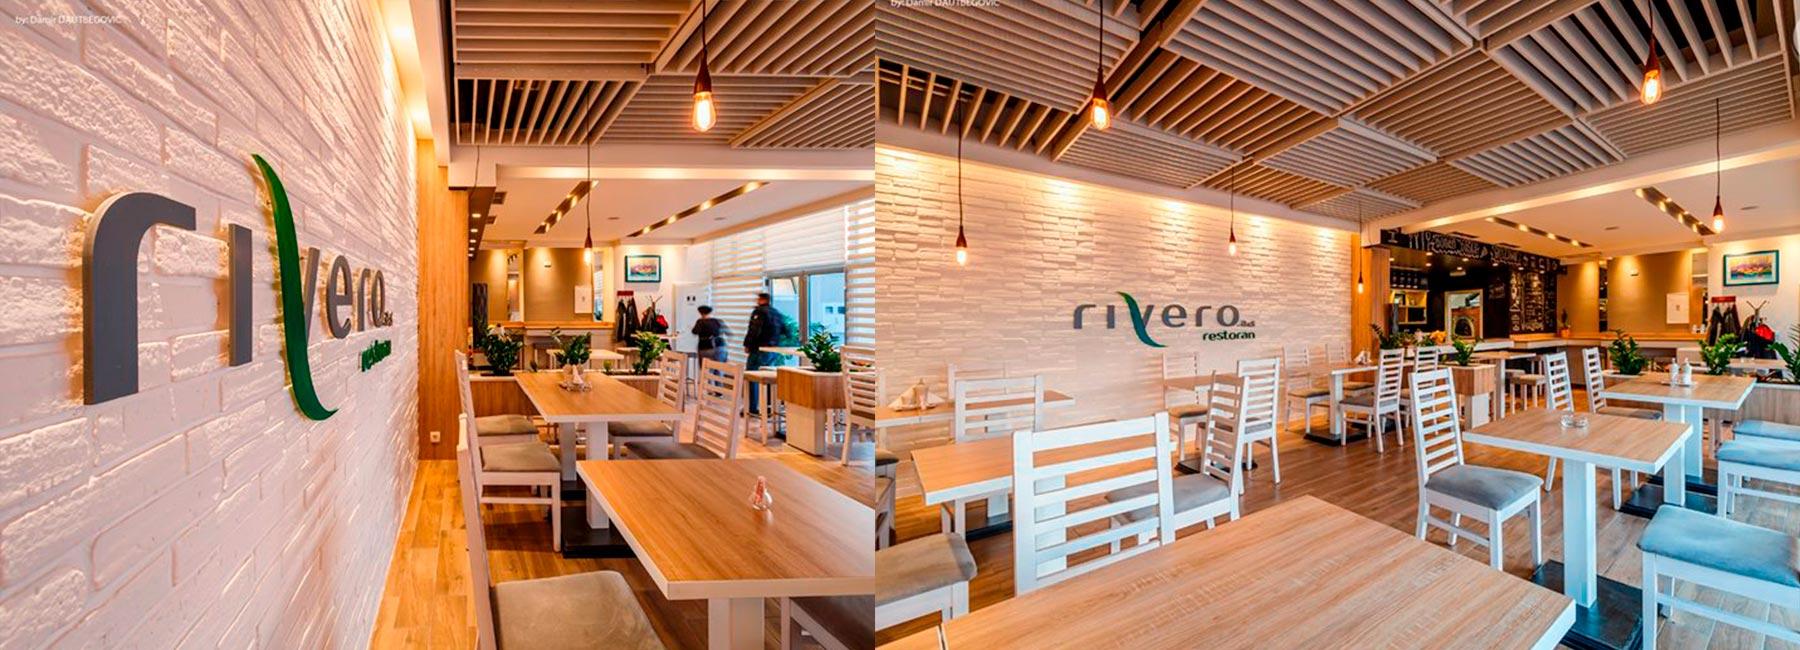 Ресторан Rivero a&s Restaurant по проекту Gepek Studio, Босния и Герцеговина